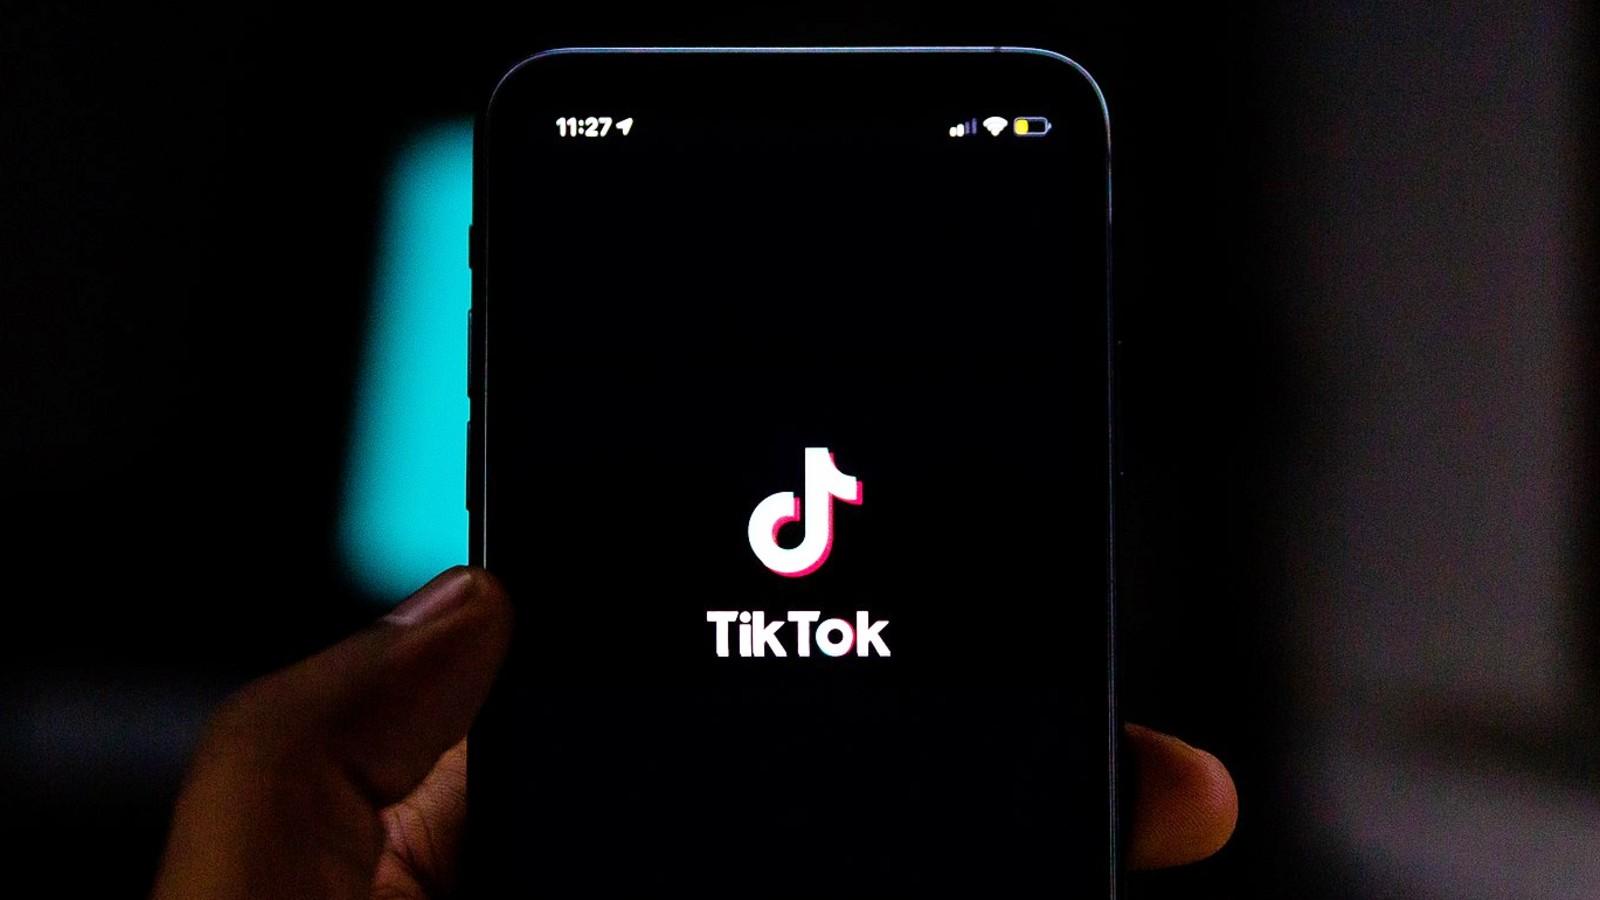 Phone with TikTok loading screen